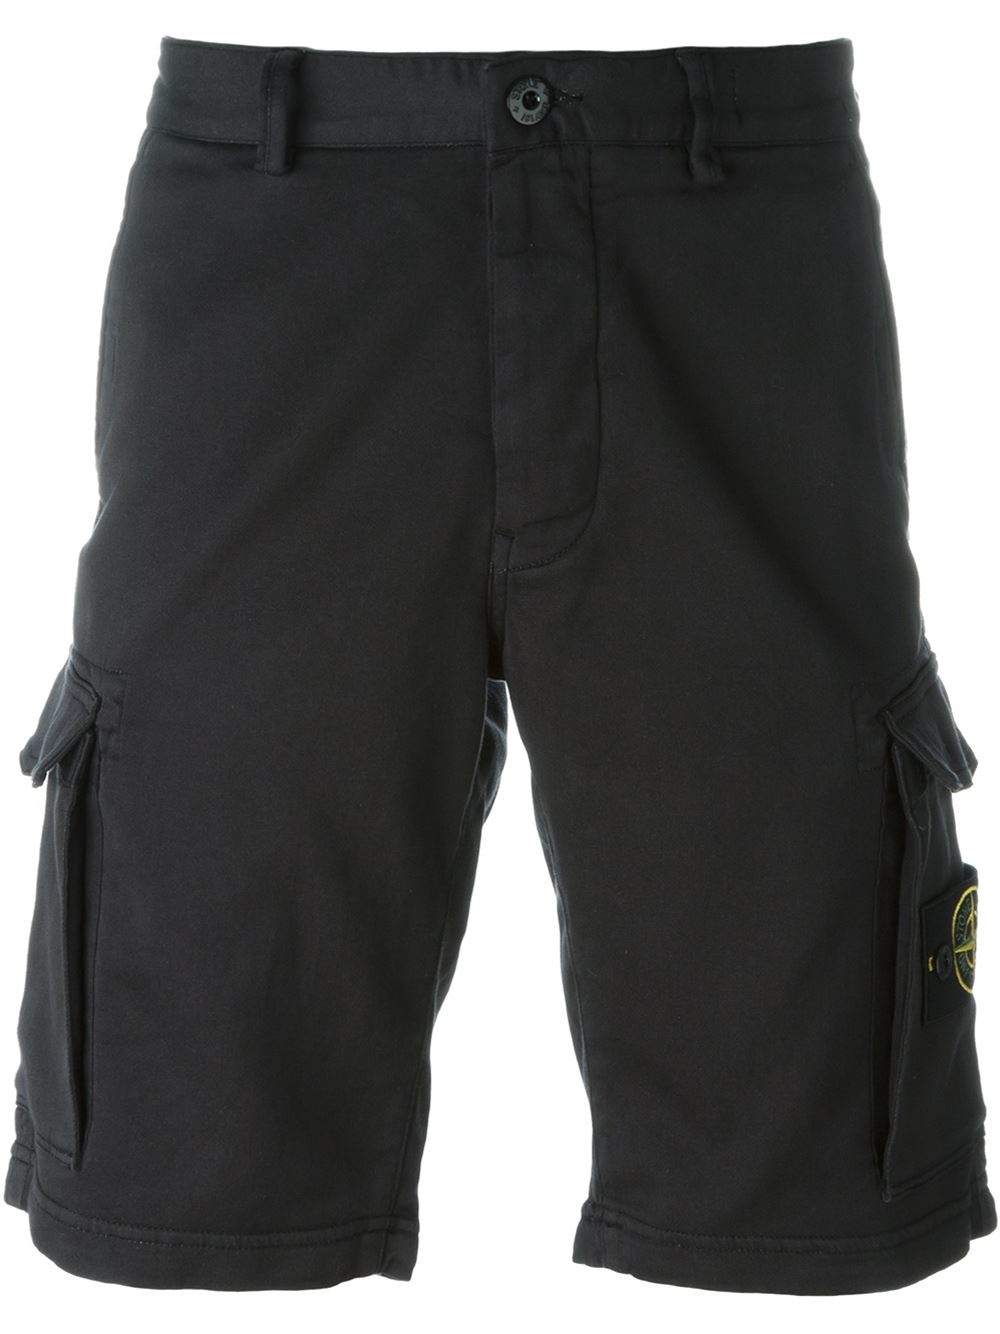 stone island cargo shorts in black for men lyst. Black Bedroom Furniture Sets. Home Design Ideas